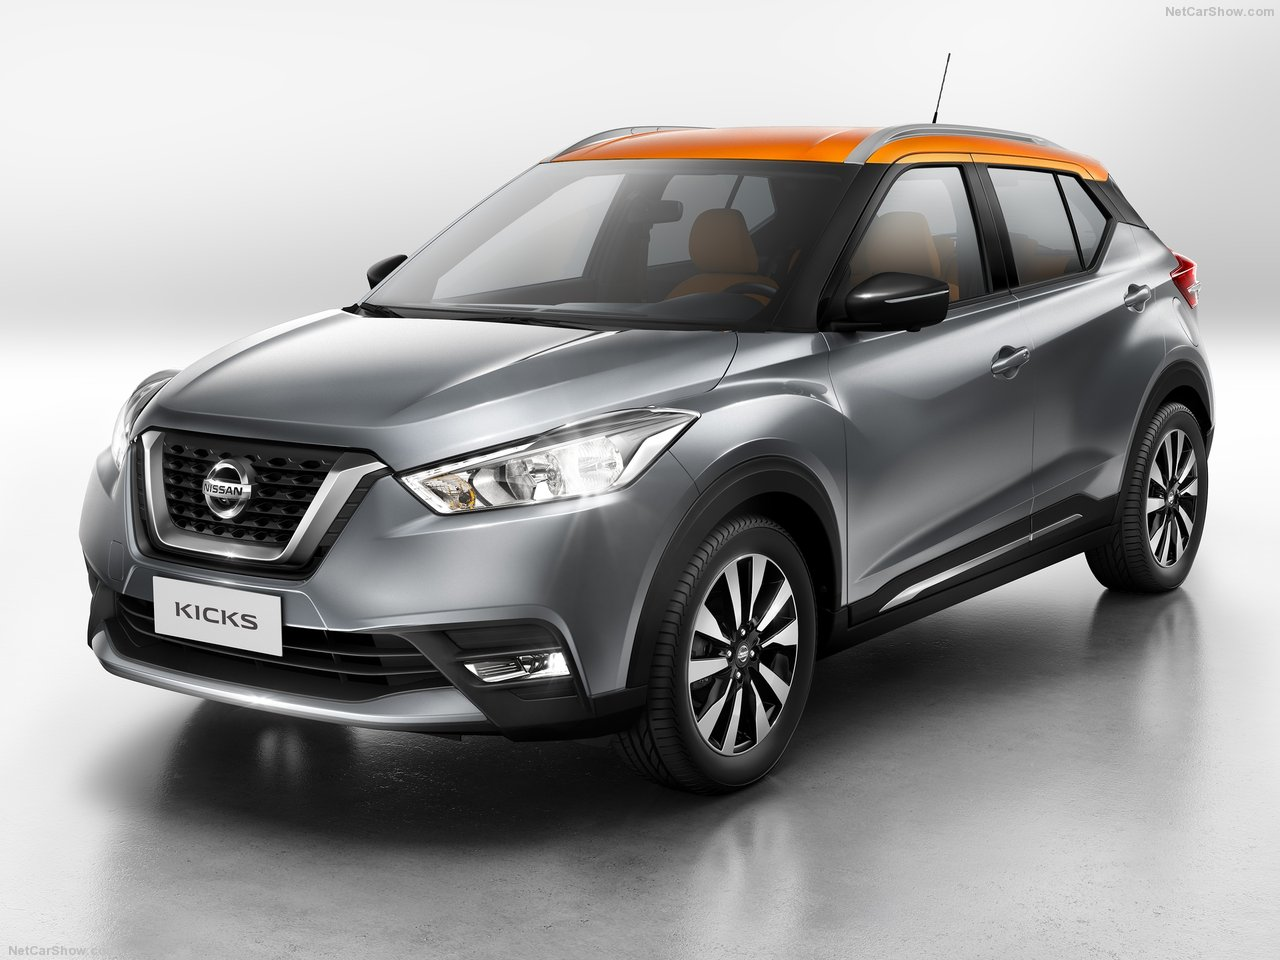 Nissan Kicks to Reach Asia-Pacific Markets 1